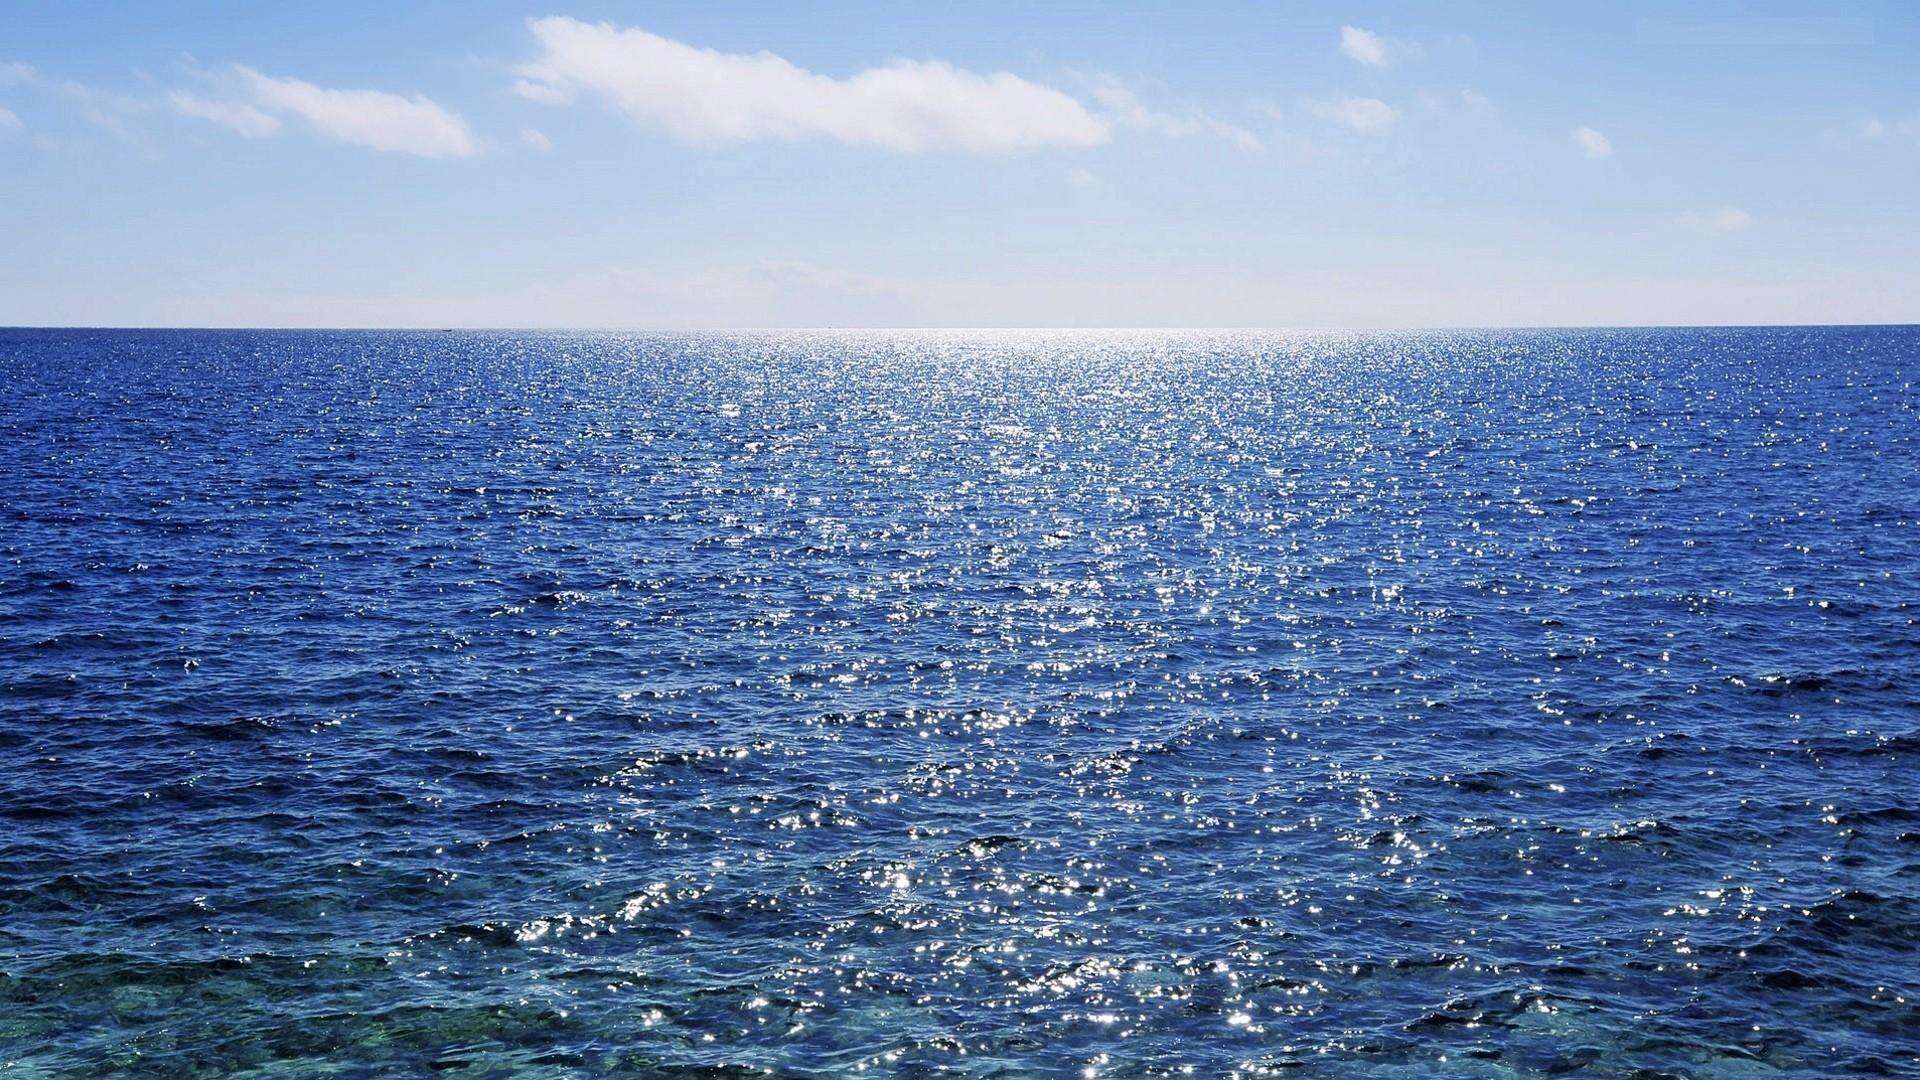 Beautiful Blue Sea Wallpaper HD Wallpapers 1920x1080